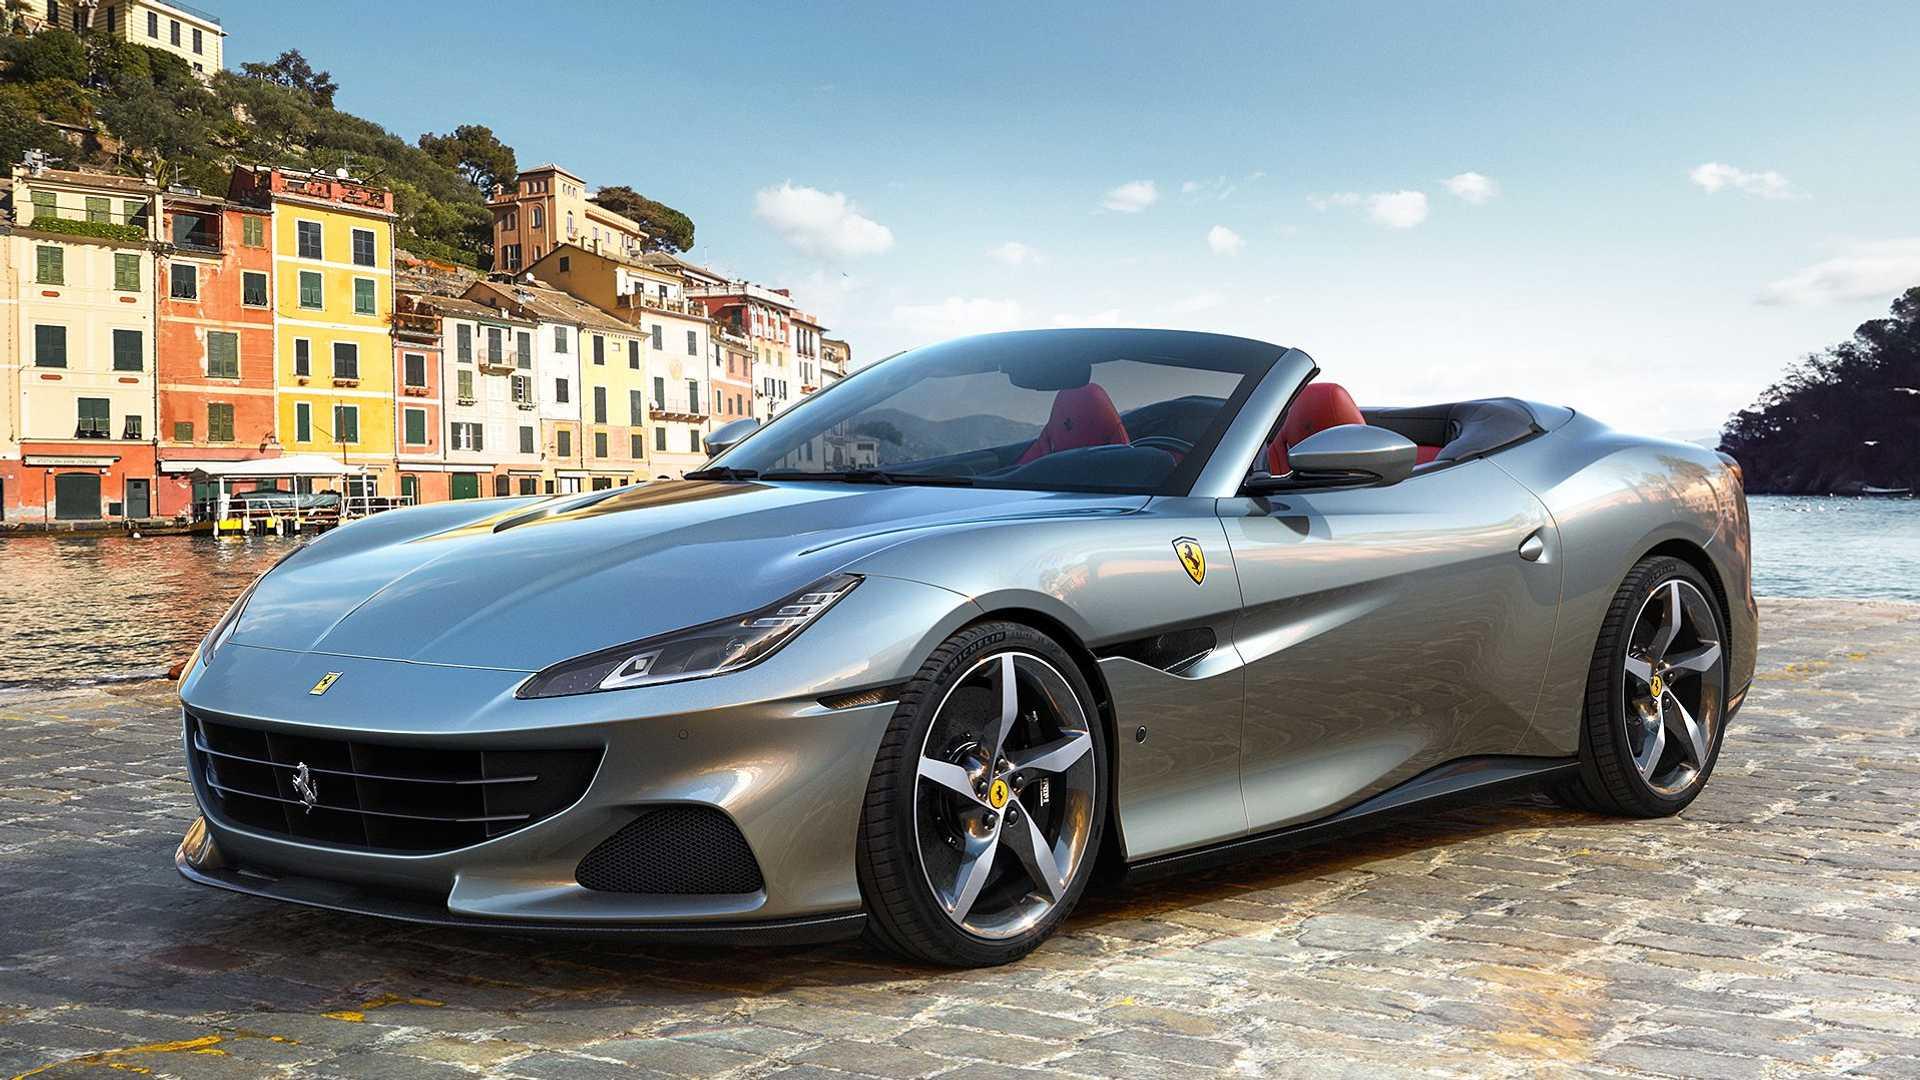 Ferrari: Ανανέωση και αύξηση ισχύος για την Portofino [vid]